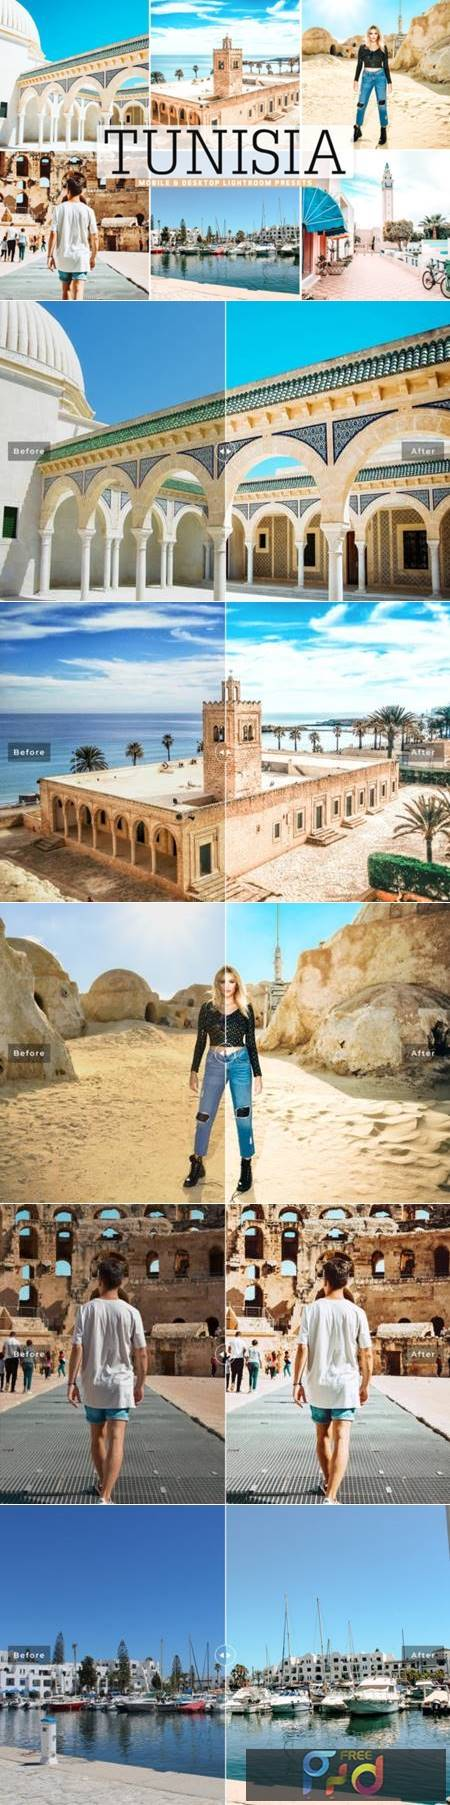 Tunisia Pro Lightroom Presets 6565313 1